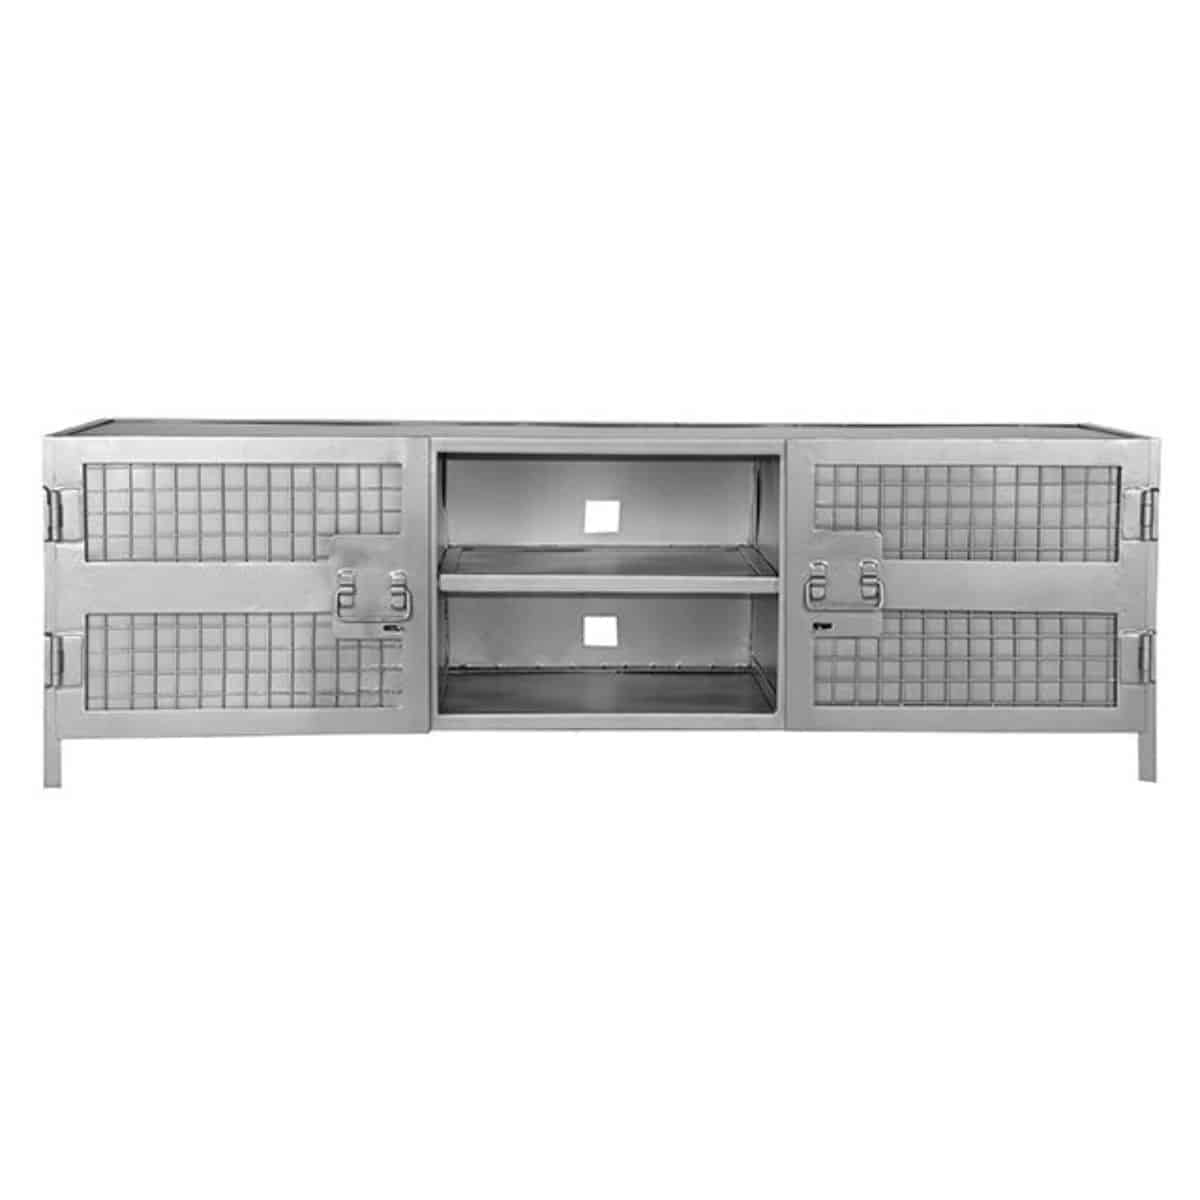 Lage Tv Kast Gebruikt.Industrieel Tv Meubel Label51 Tv Meubel Gate Metaal Vintage 160cm